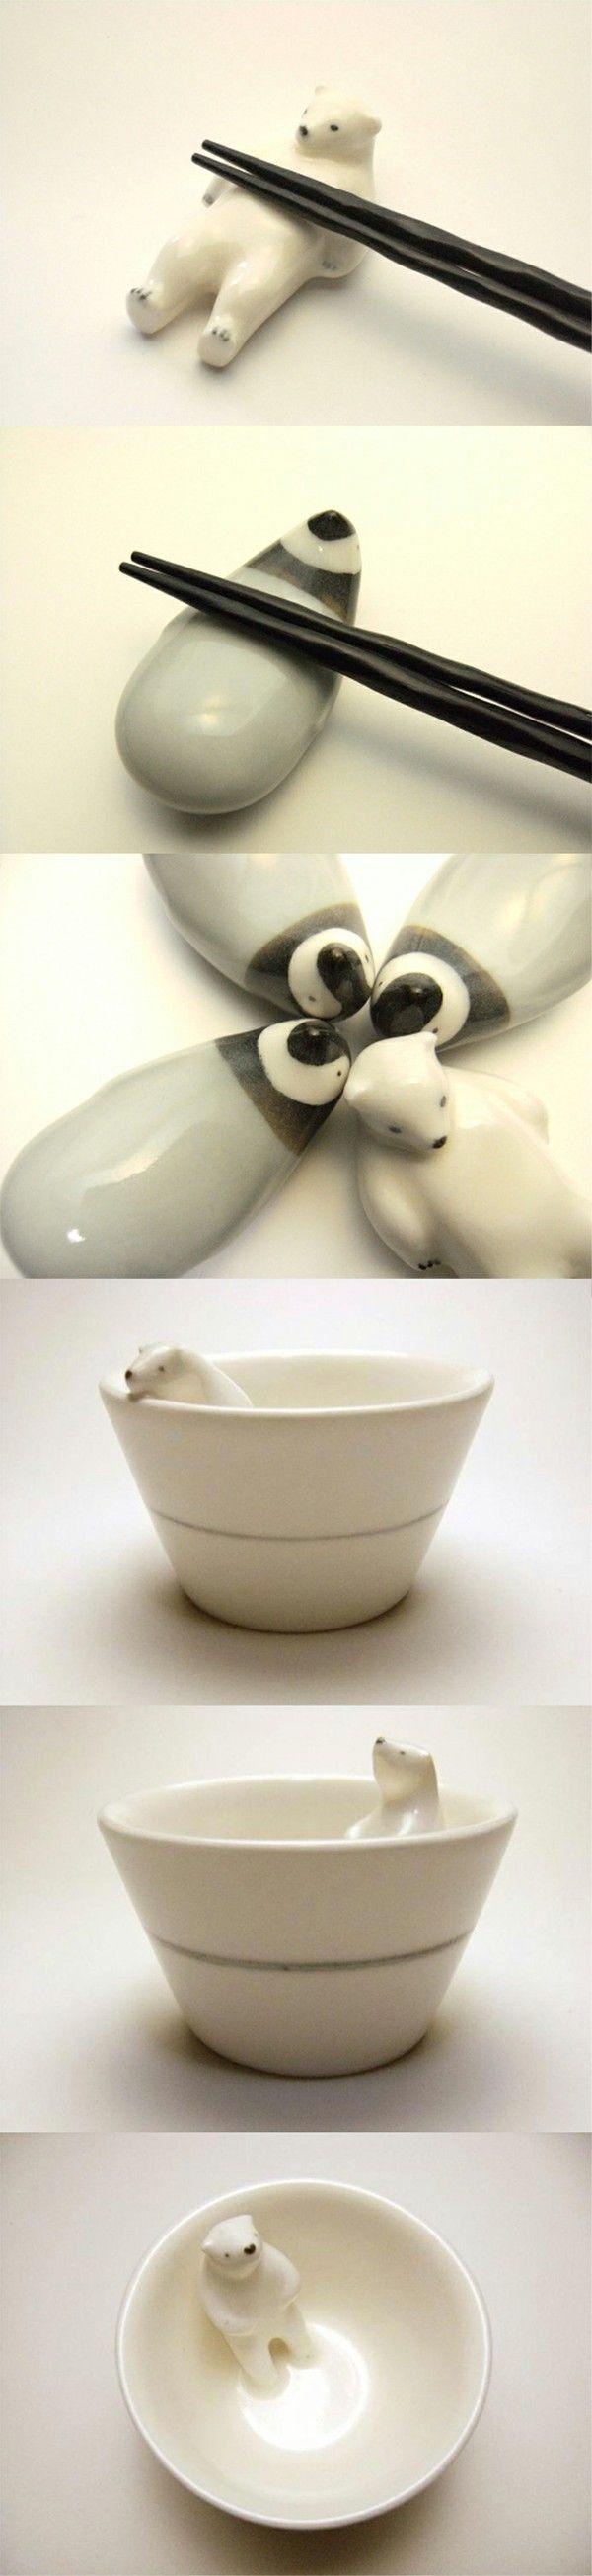 Chopstick holder polar bears and penguins! ! ! ! Potters Tada Seizo founder of the brand - Le soil Raku-do